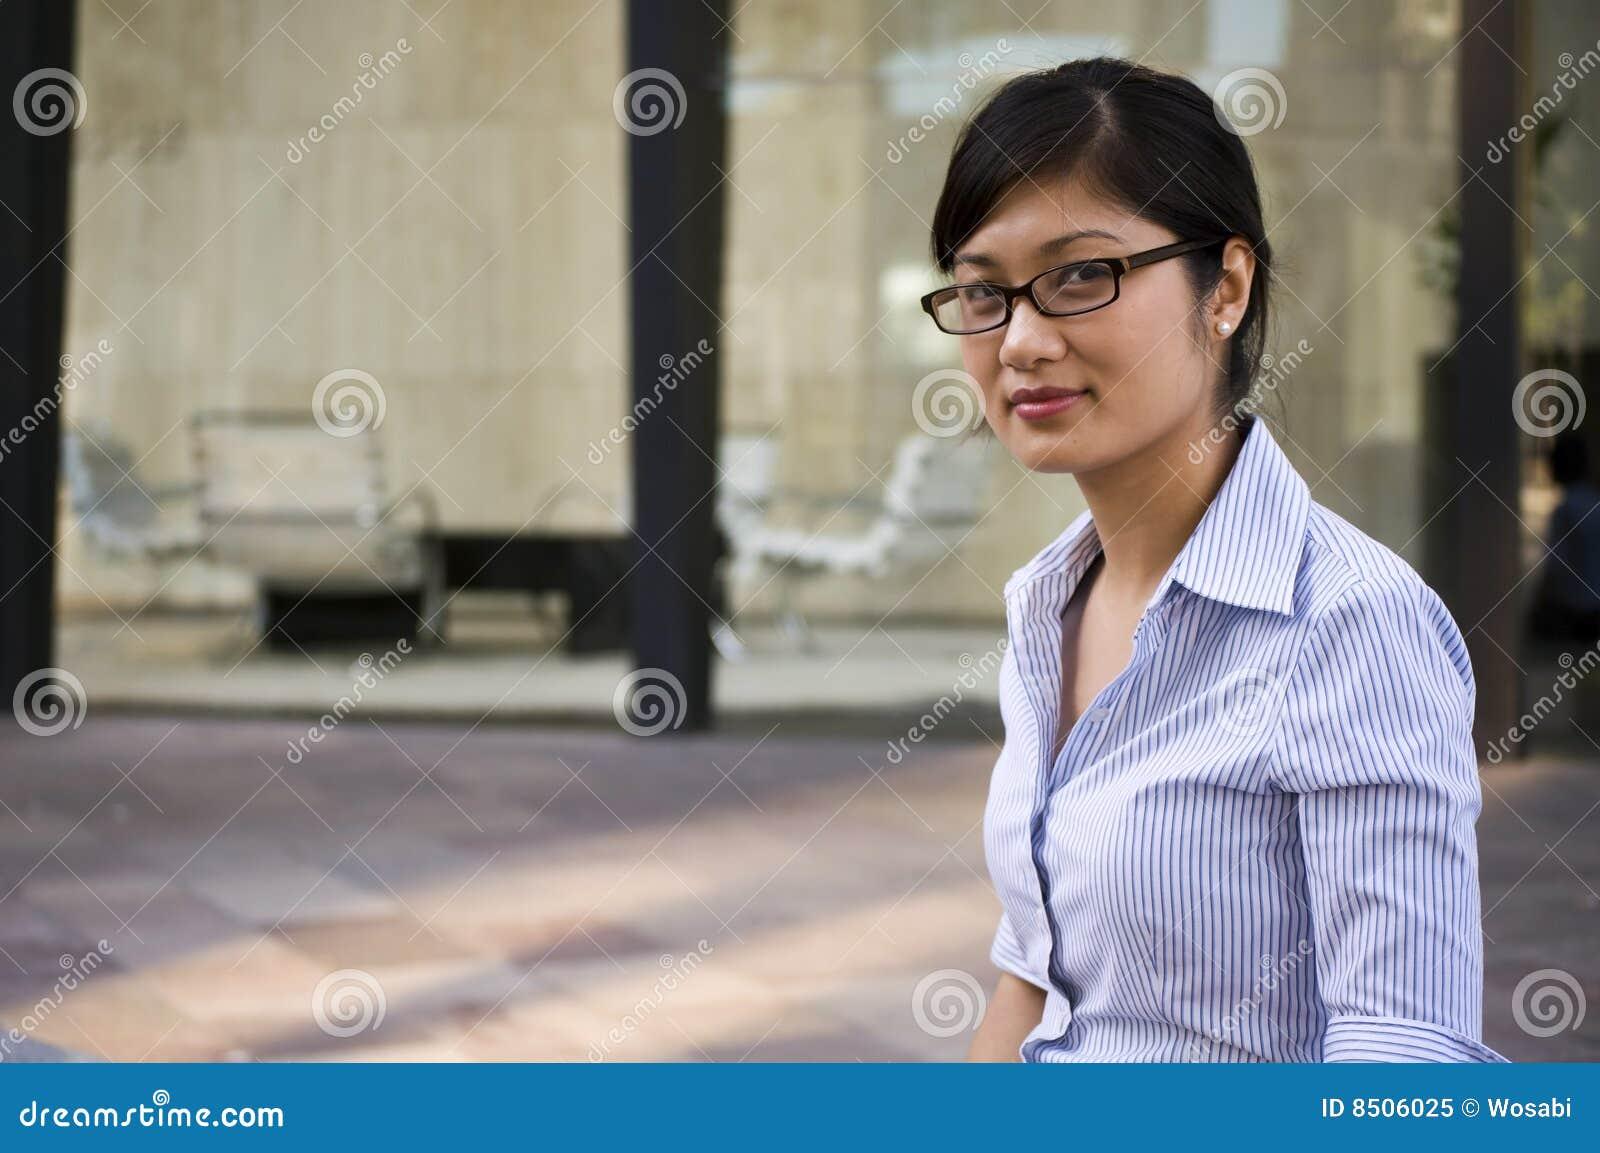 Professional Intelligent Woman Royalty Free Stock Photo